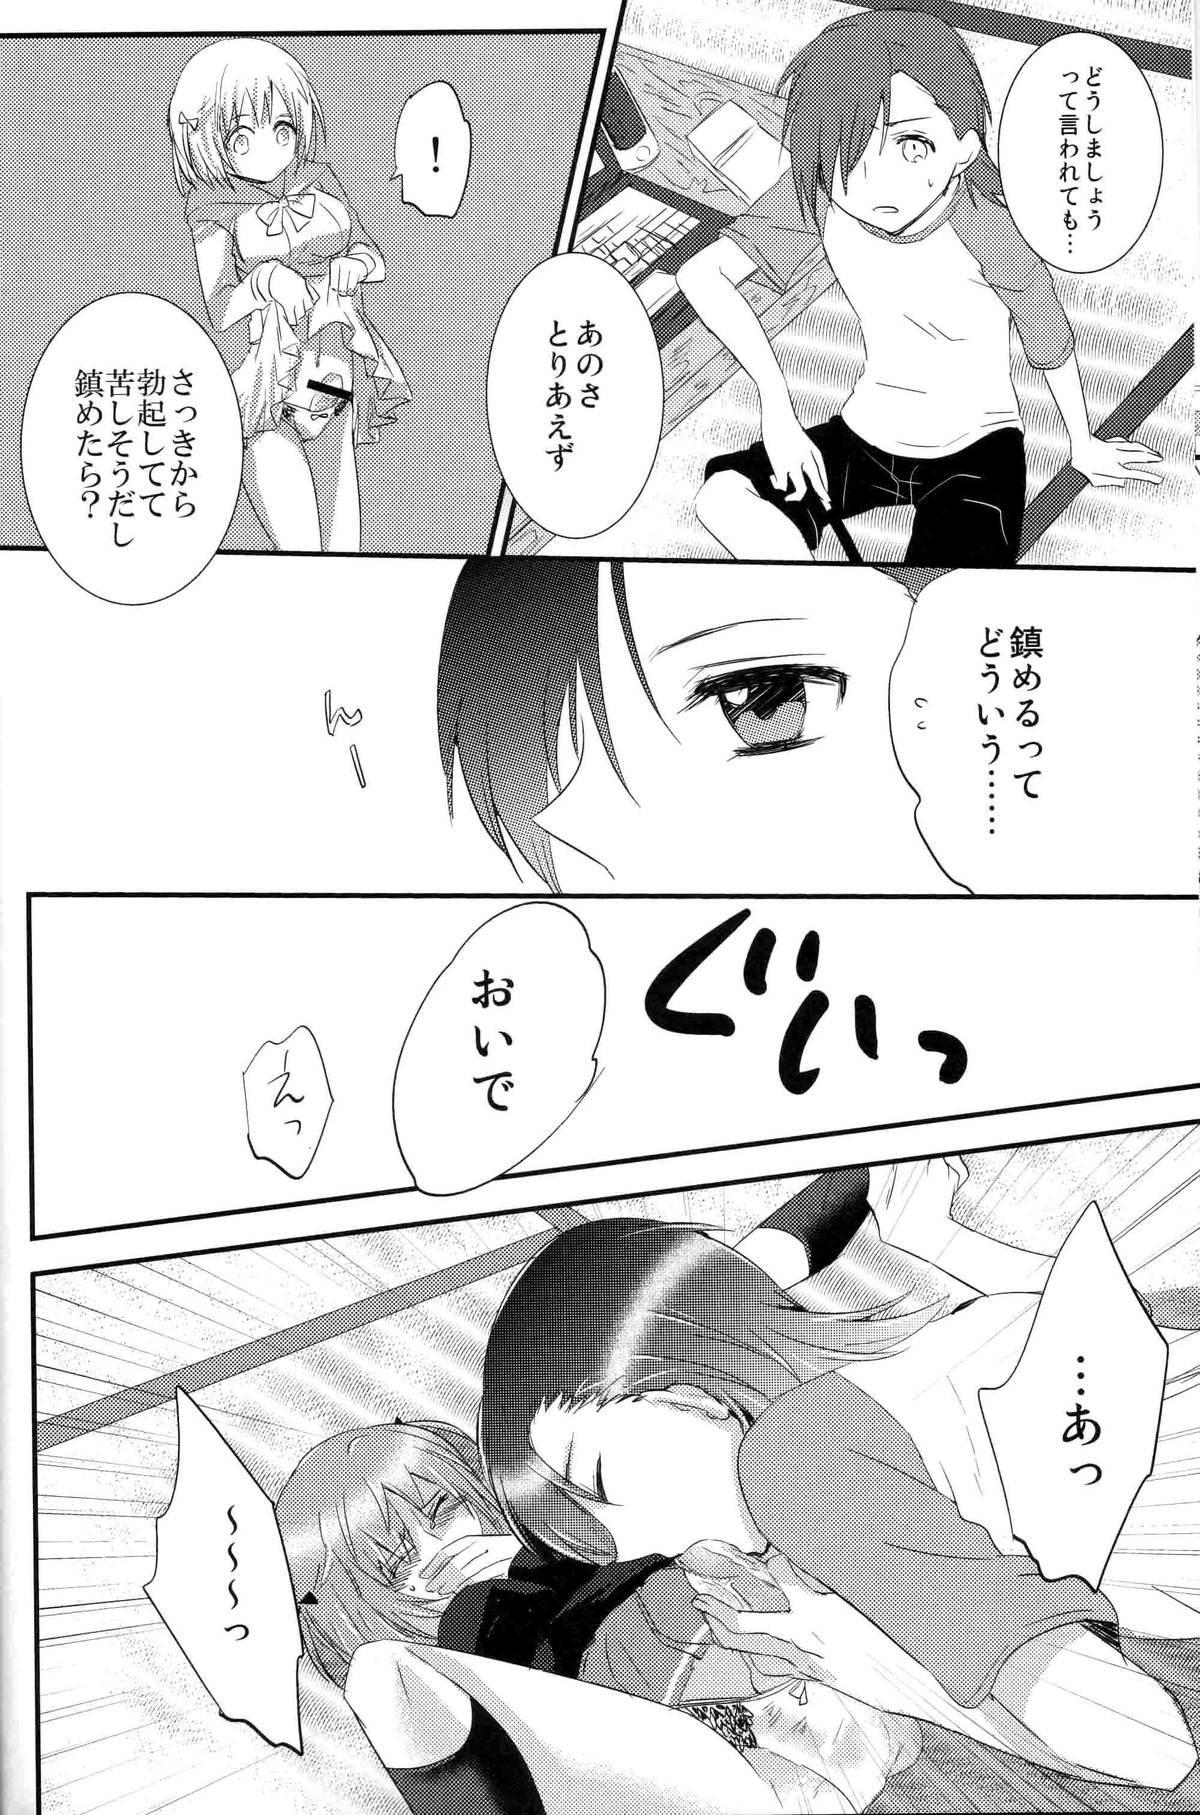 Futanari Chi-chan x Maougumi 4